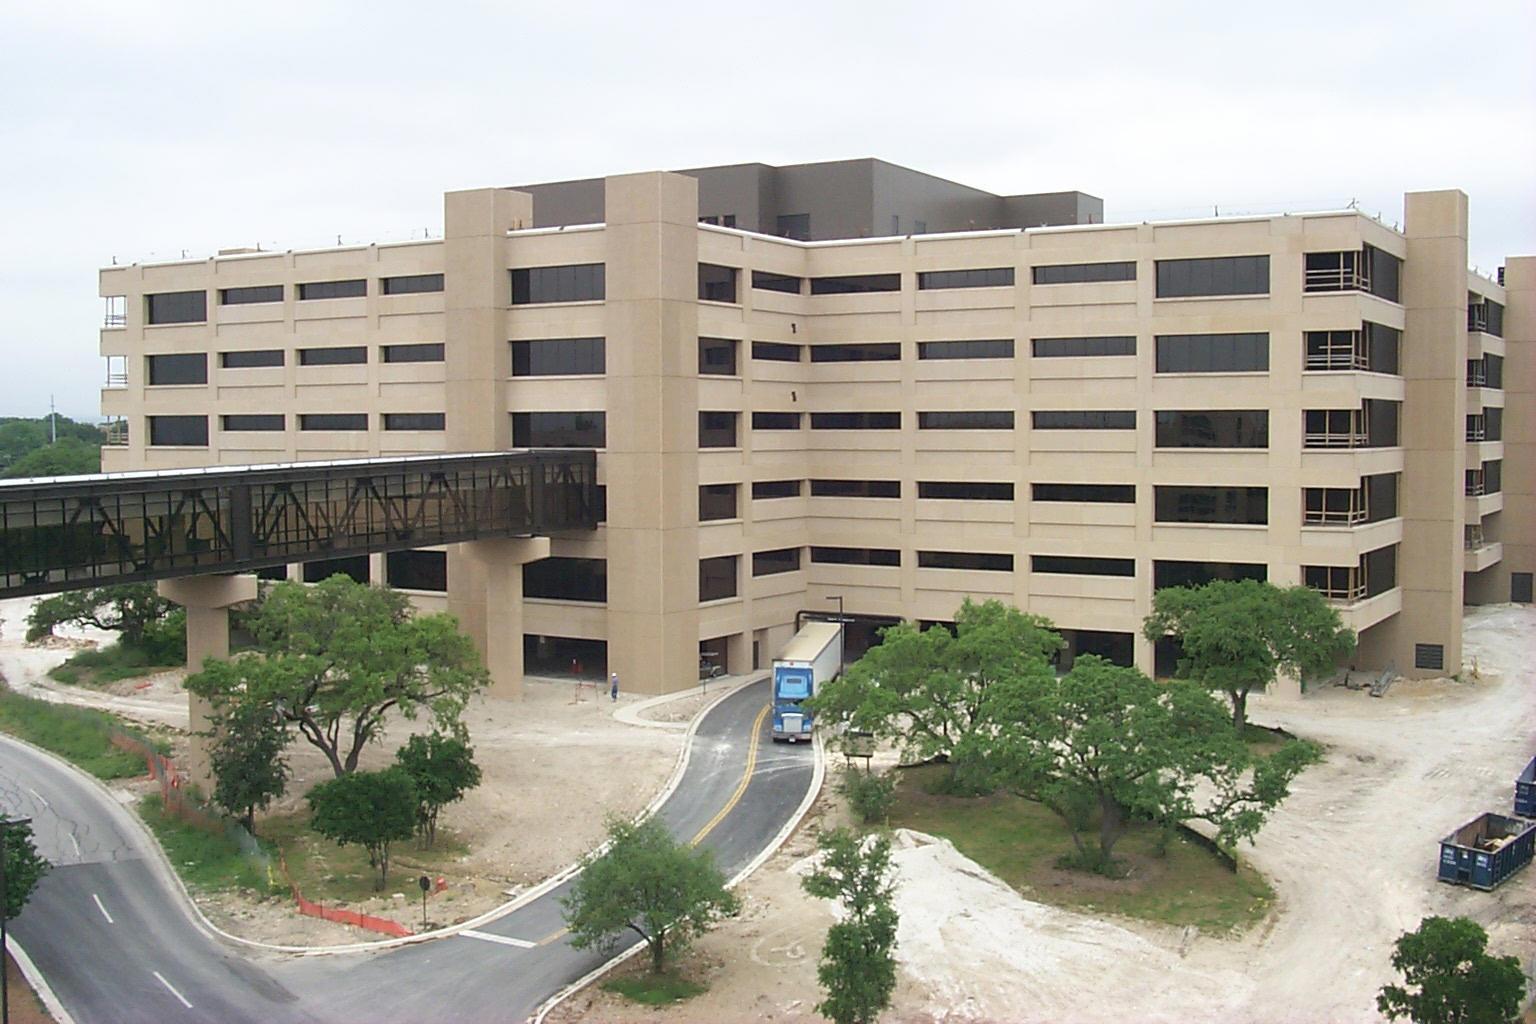 USAA McDermott Building